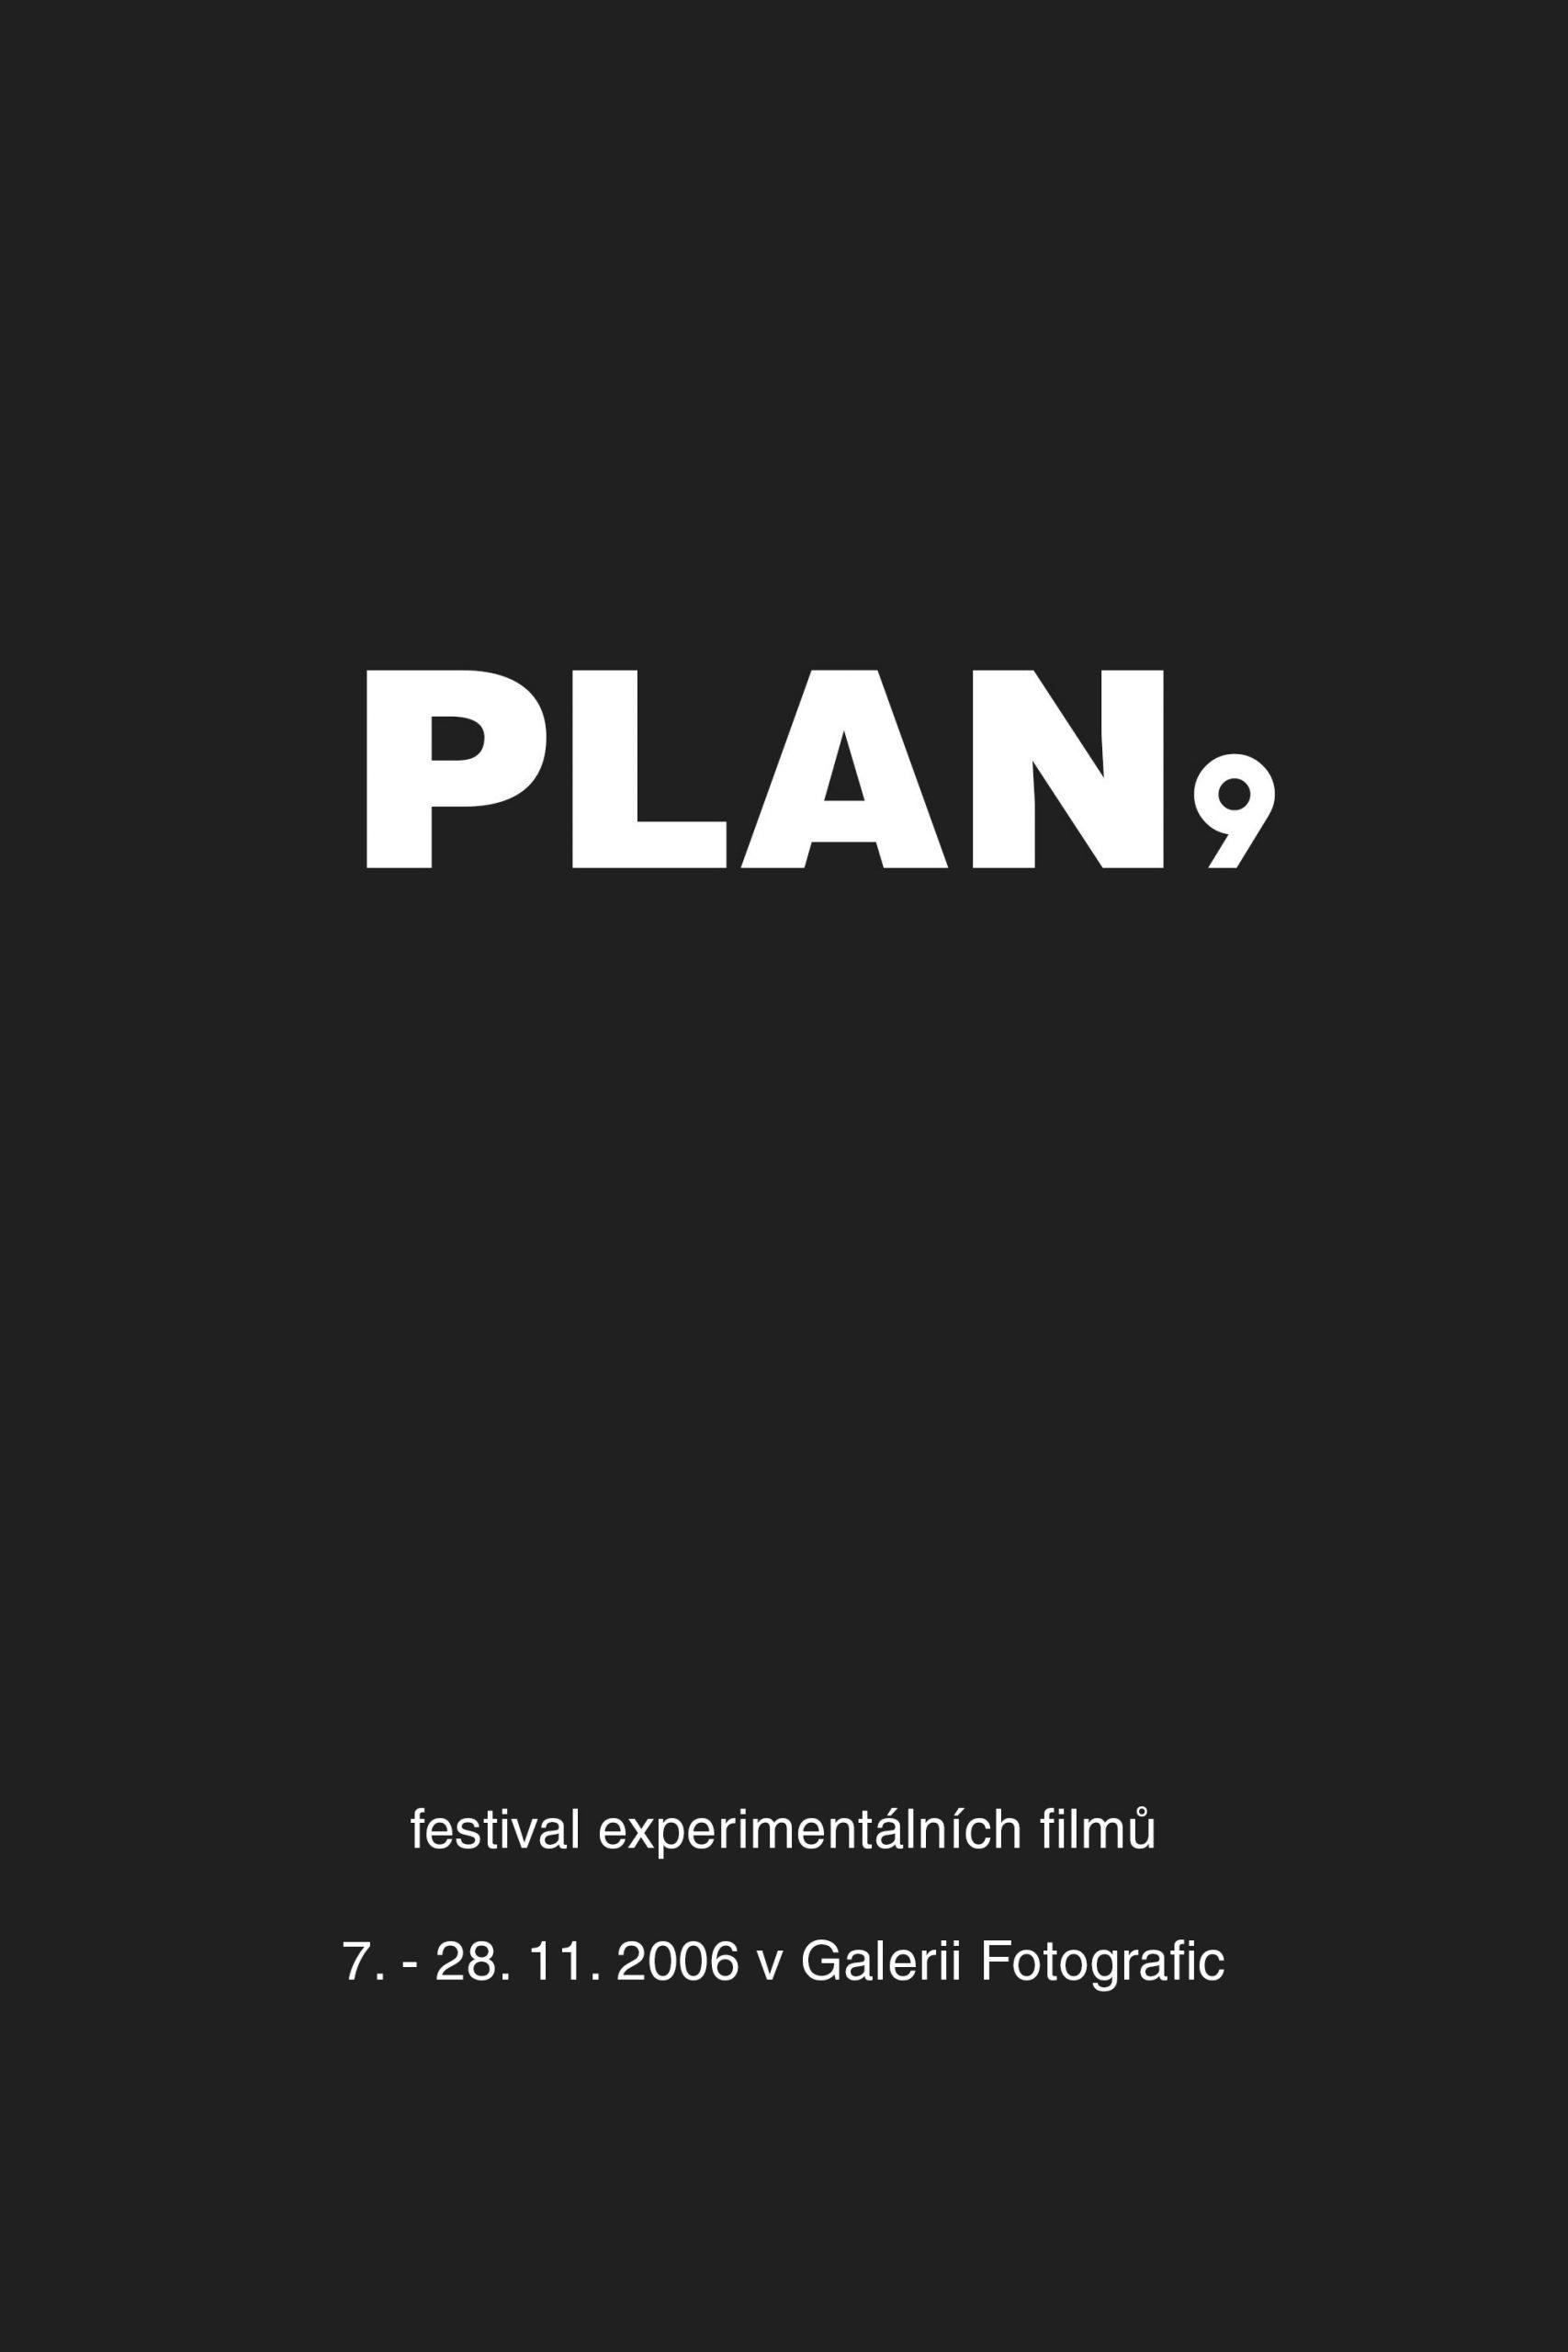 PLAN 9 2006 film festival at Fotografic - poster